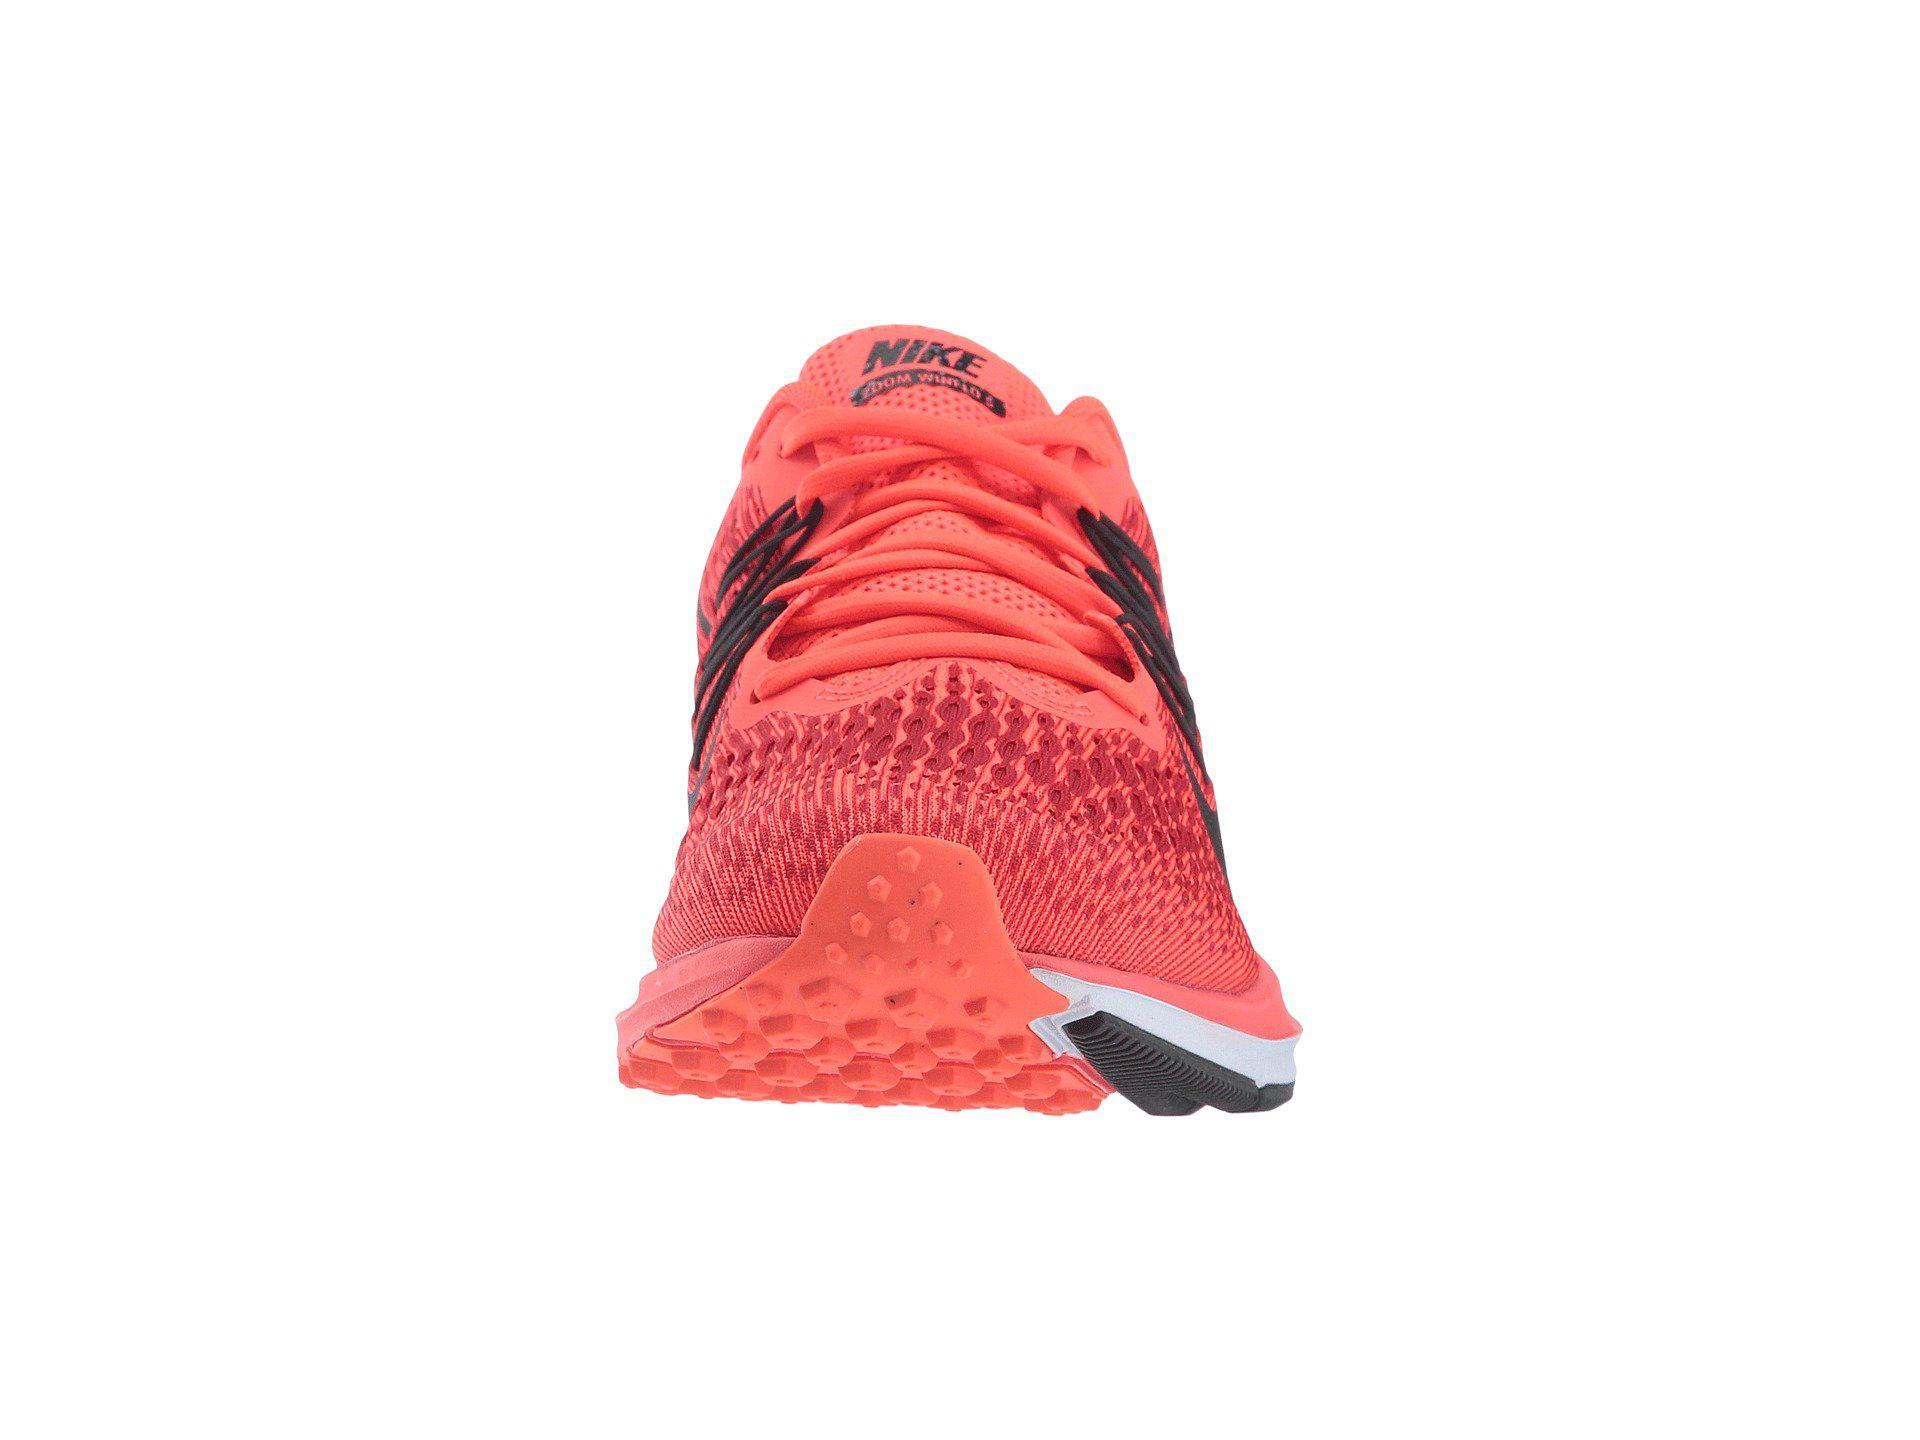 Npufjv3699 Départ Marine Zoom Winflo 5 Chaussures Volt Nike Air 3TlKFJu1c